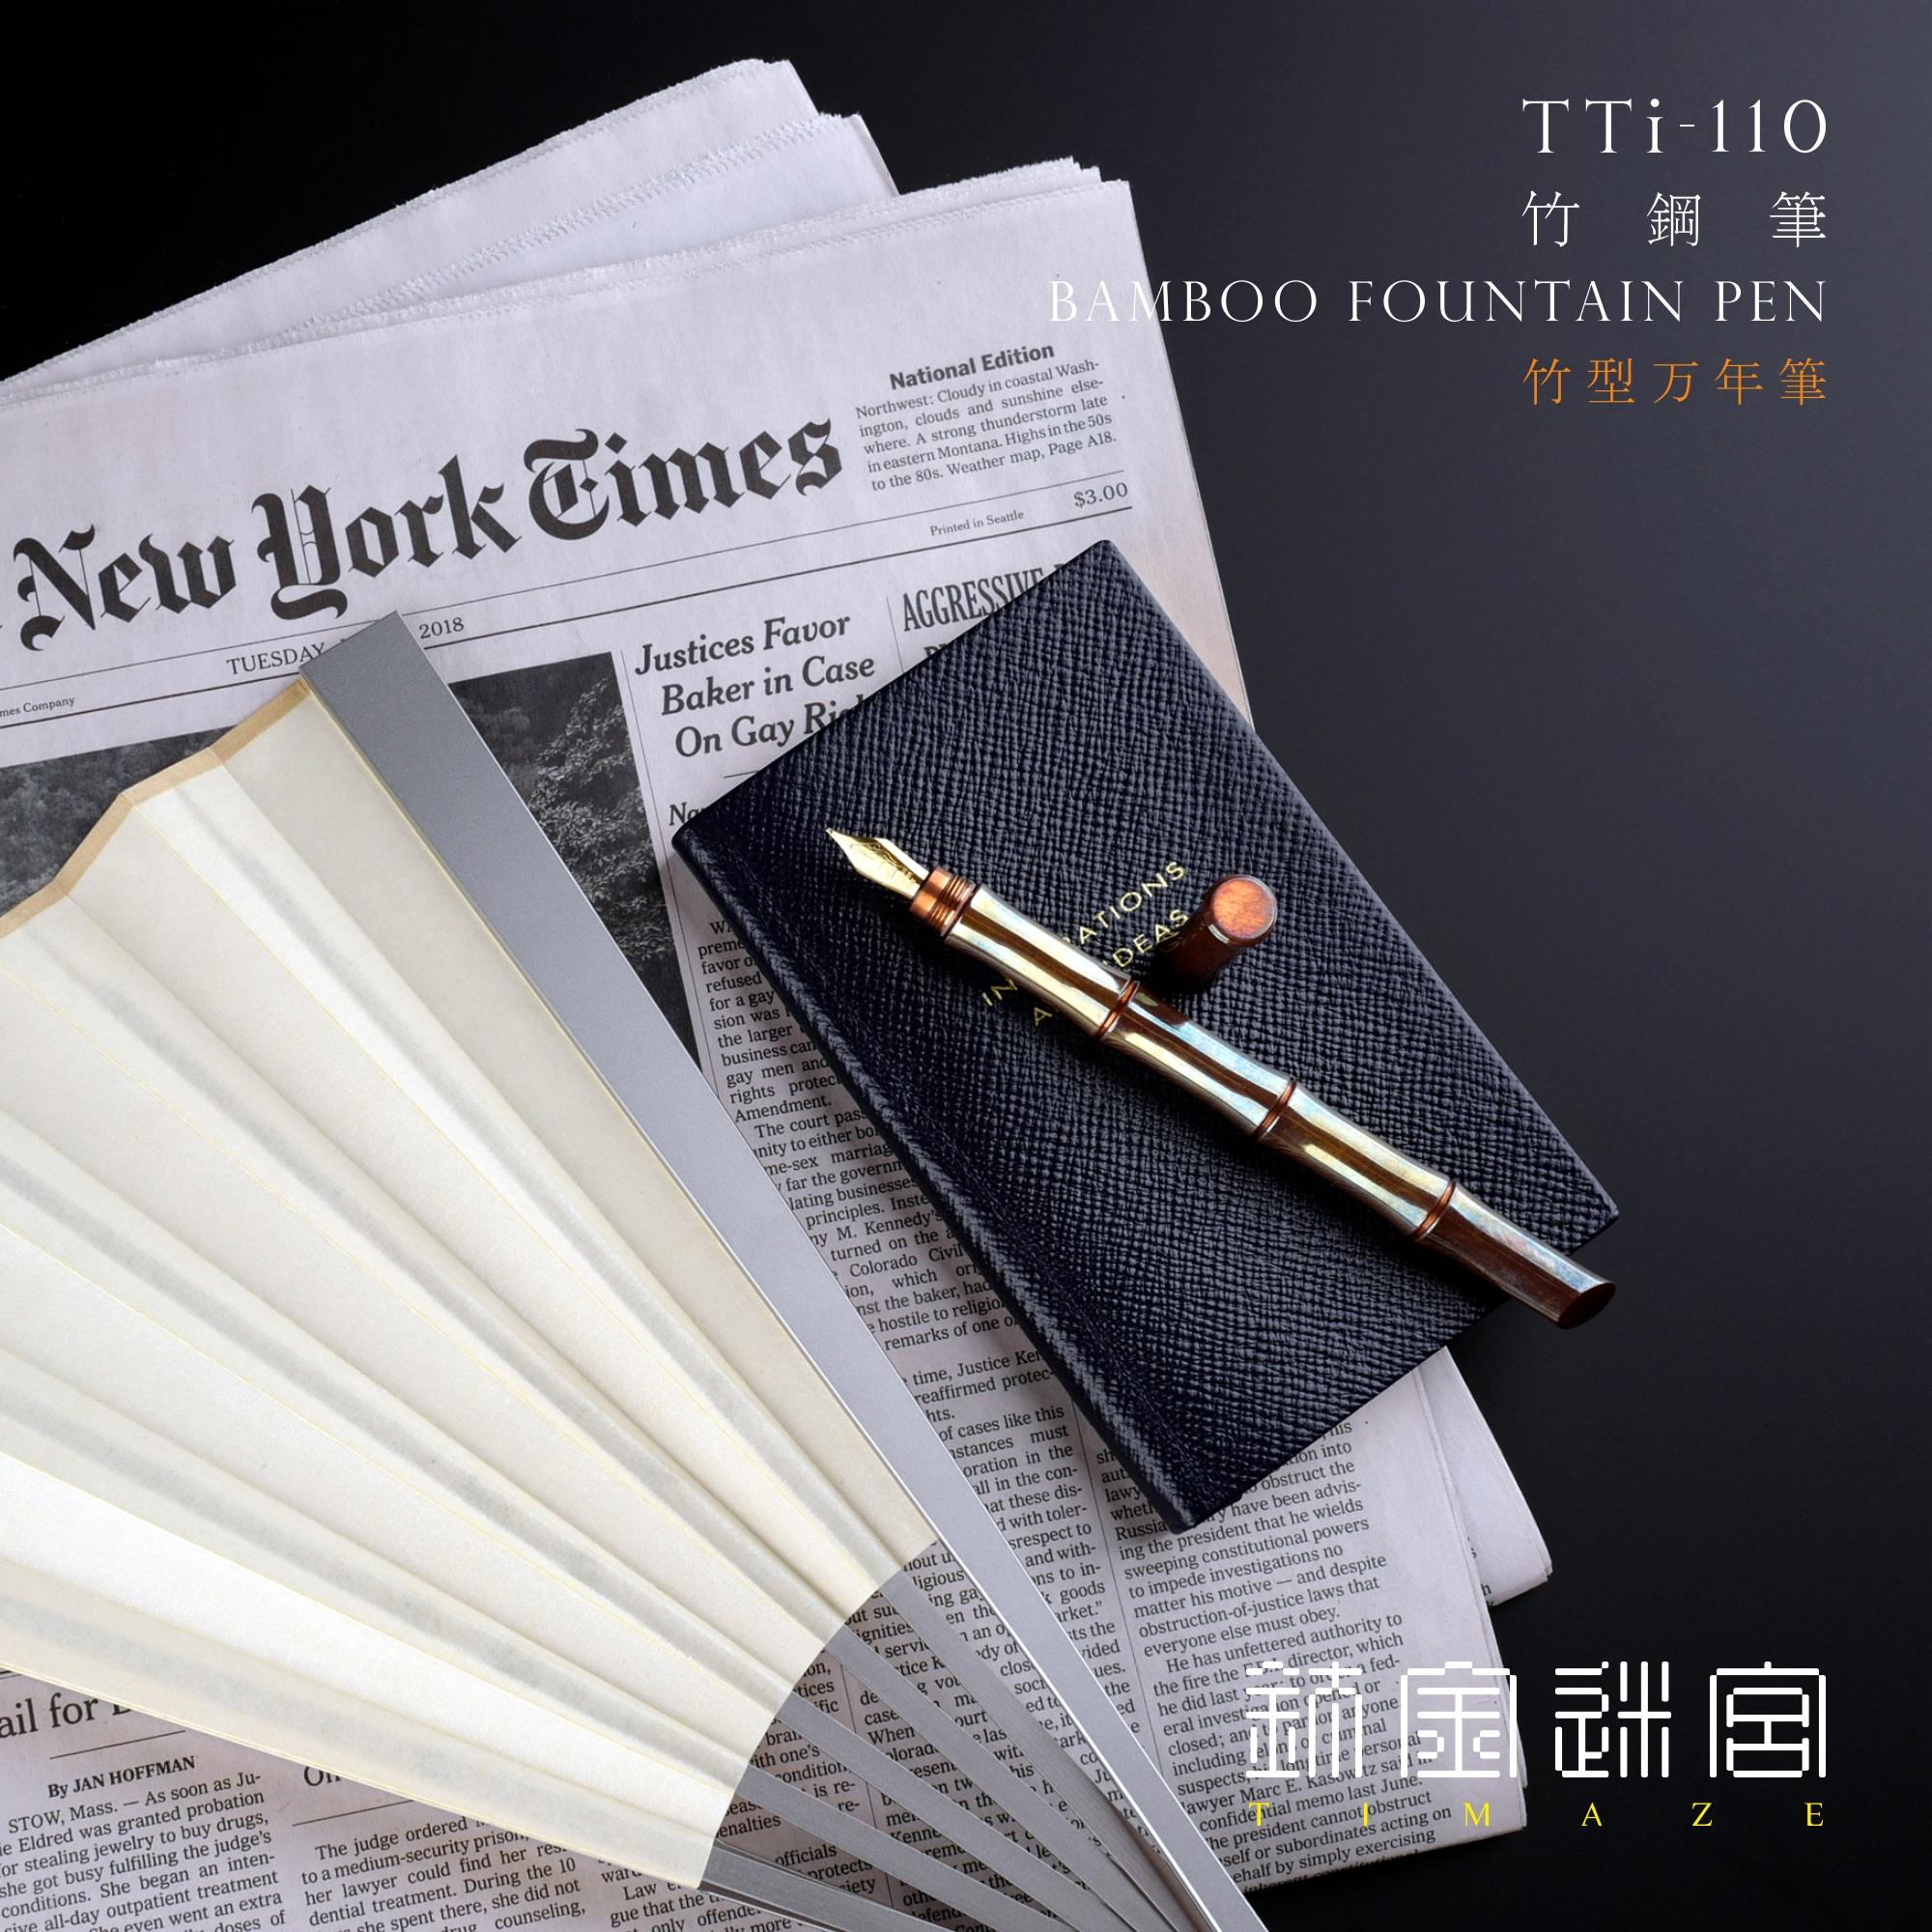 0-TTi-110-中国摩点02.jpg